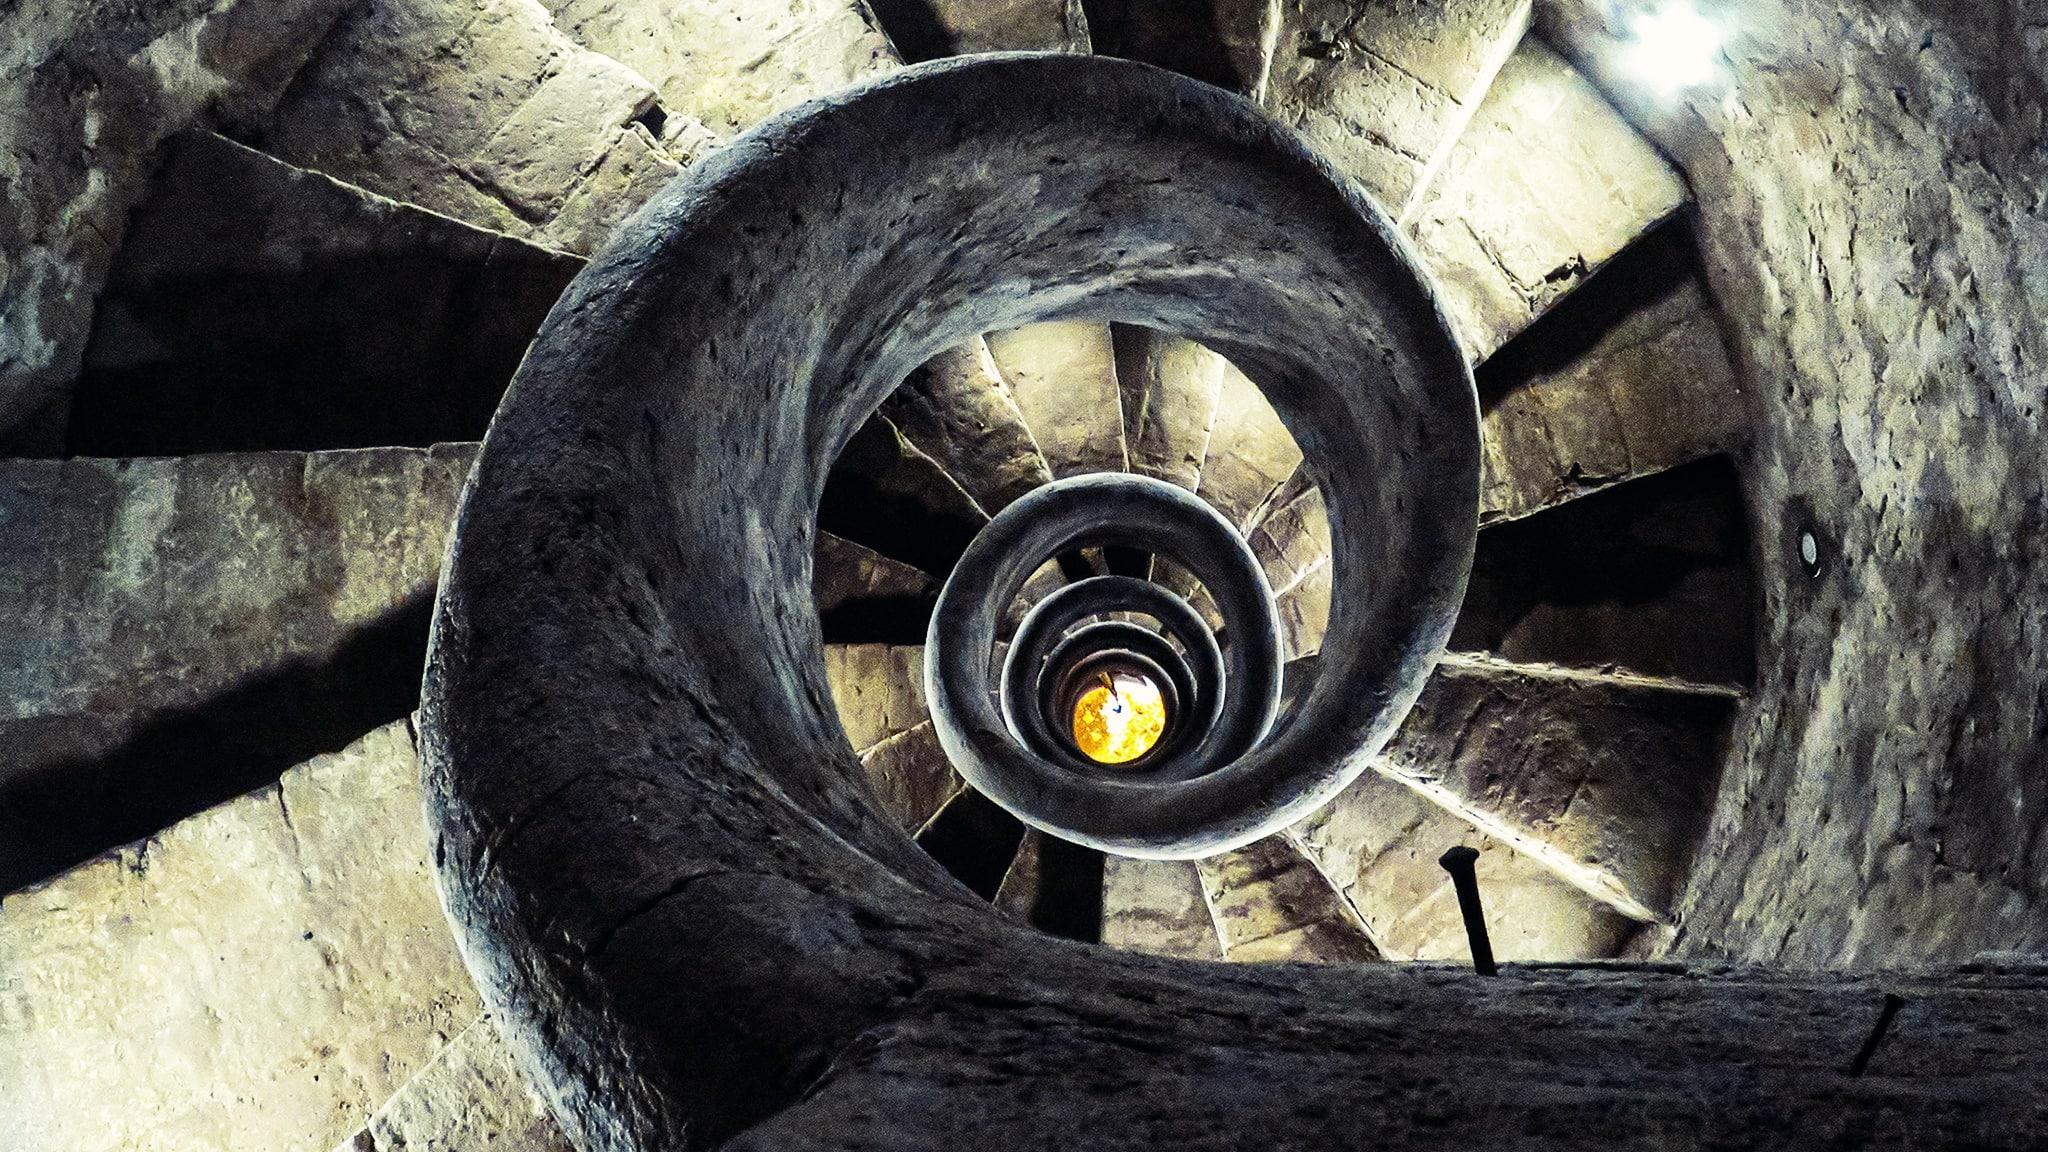 Rai 5 Under Italy: I sotterranei di Osimo - S2E5